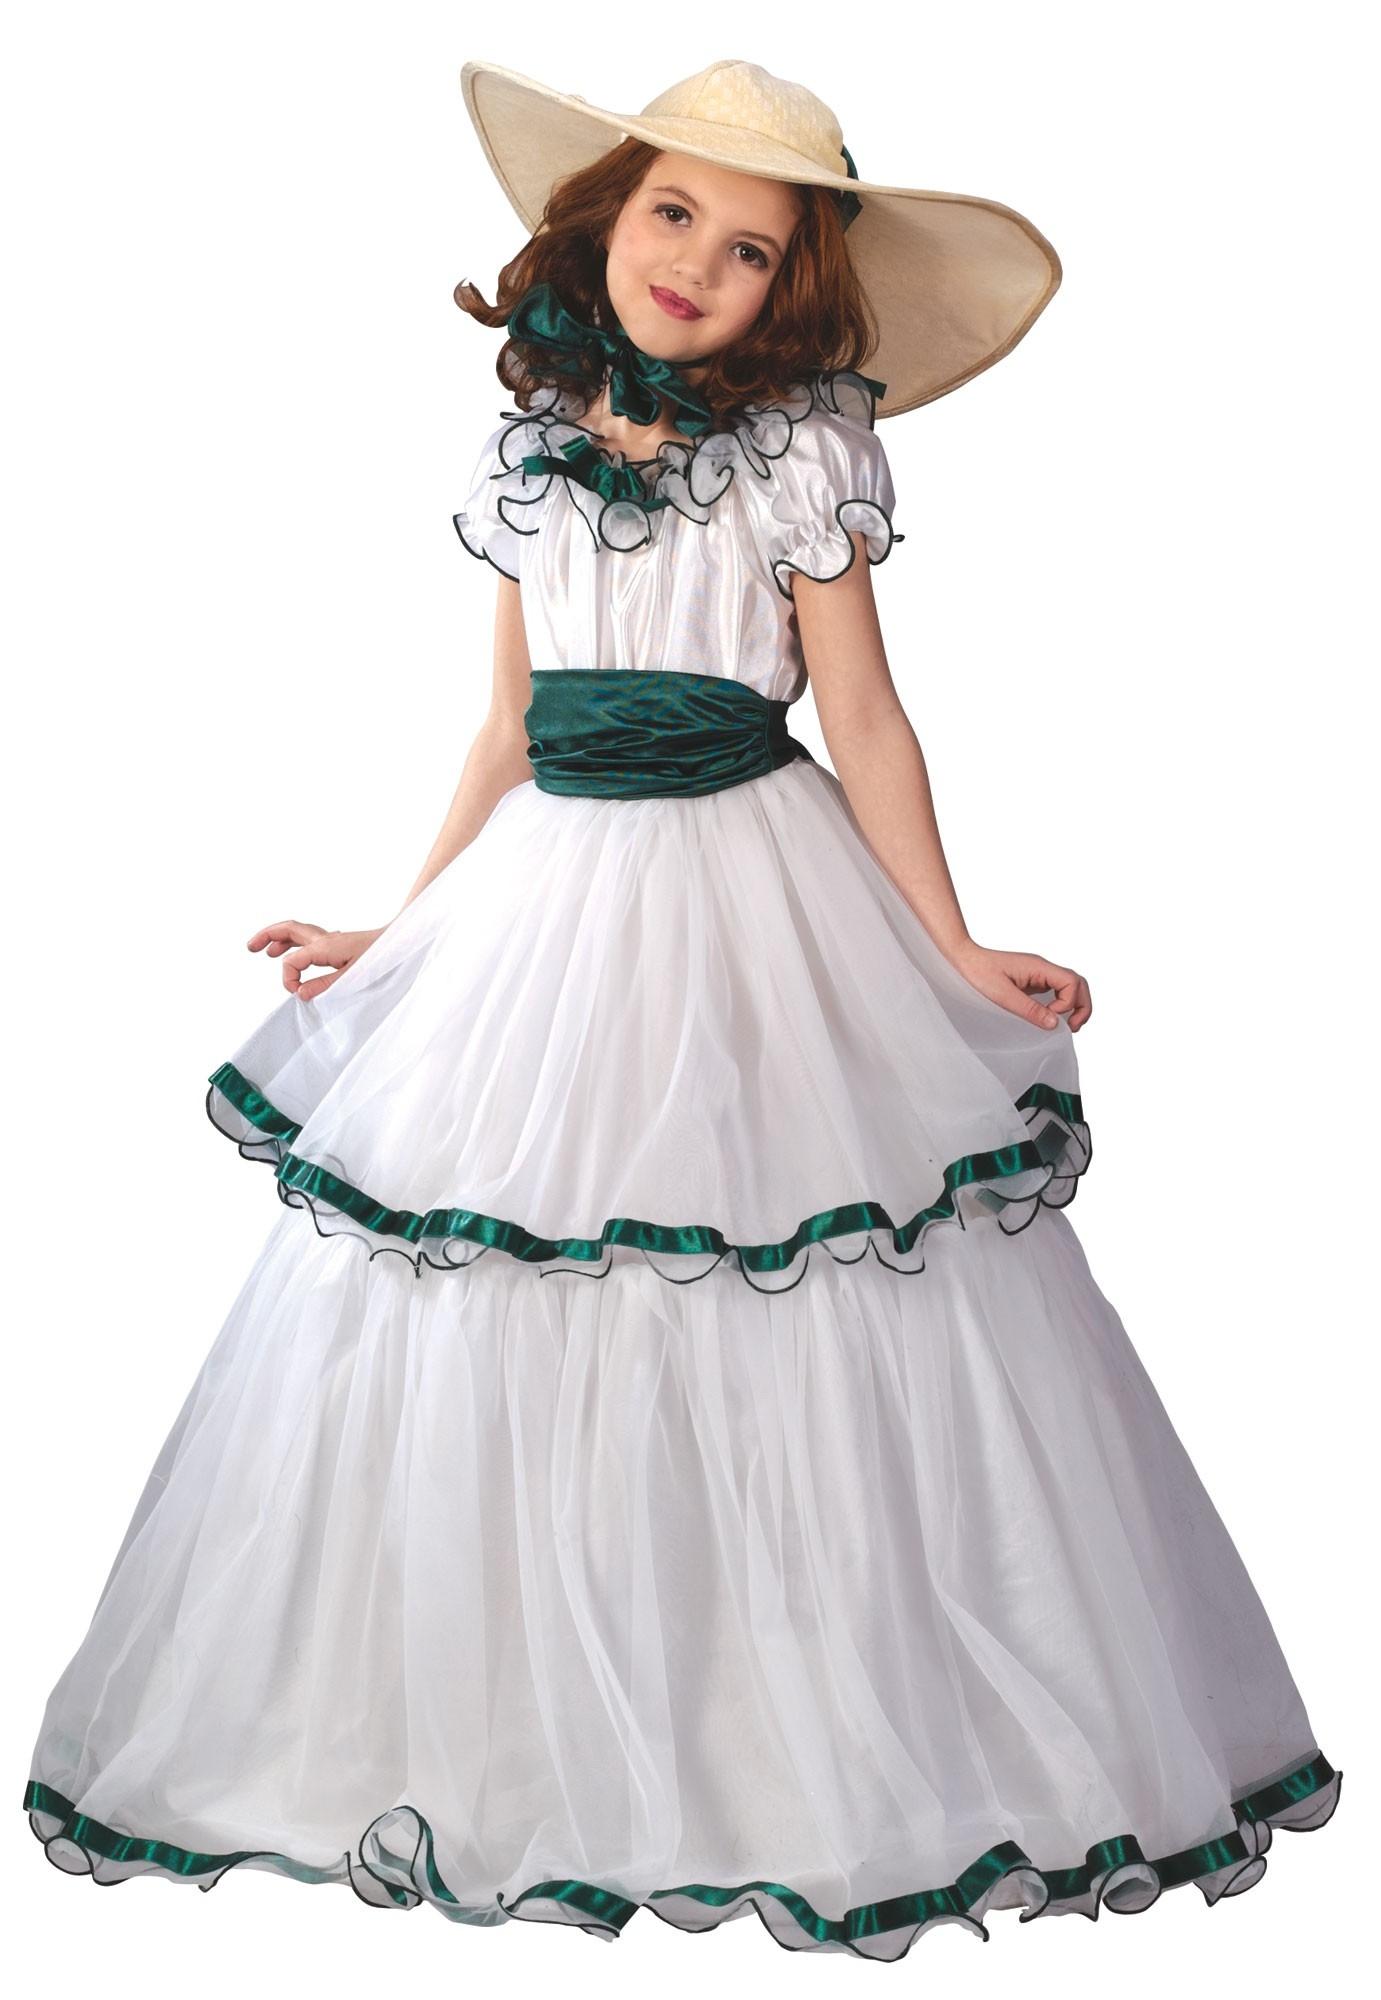 Детский костюм Скарлетт (34-38) детский костюм фиолетовой феи виндс 34